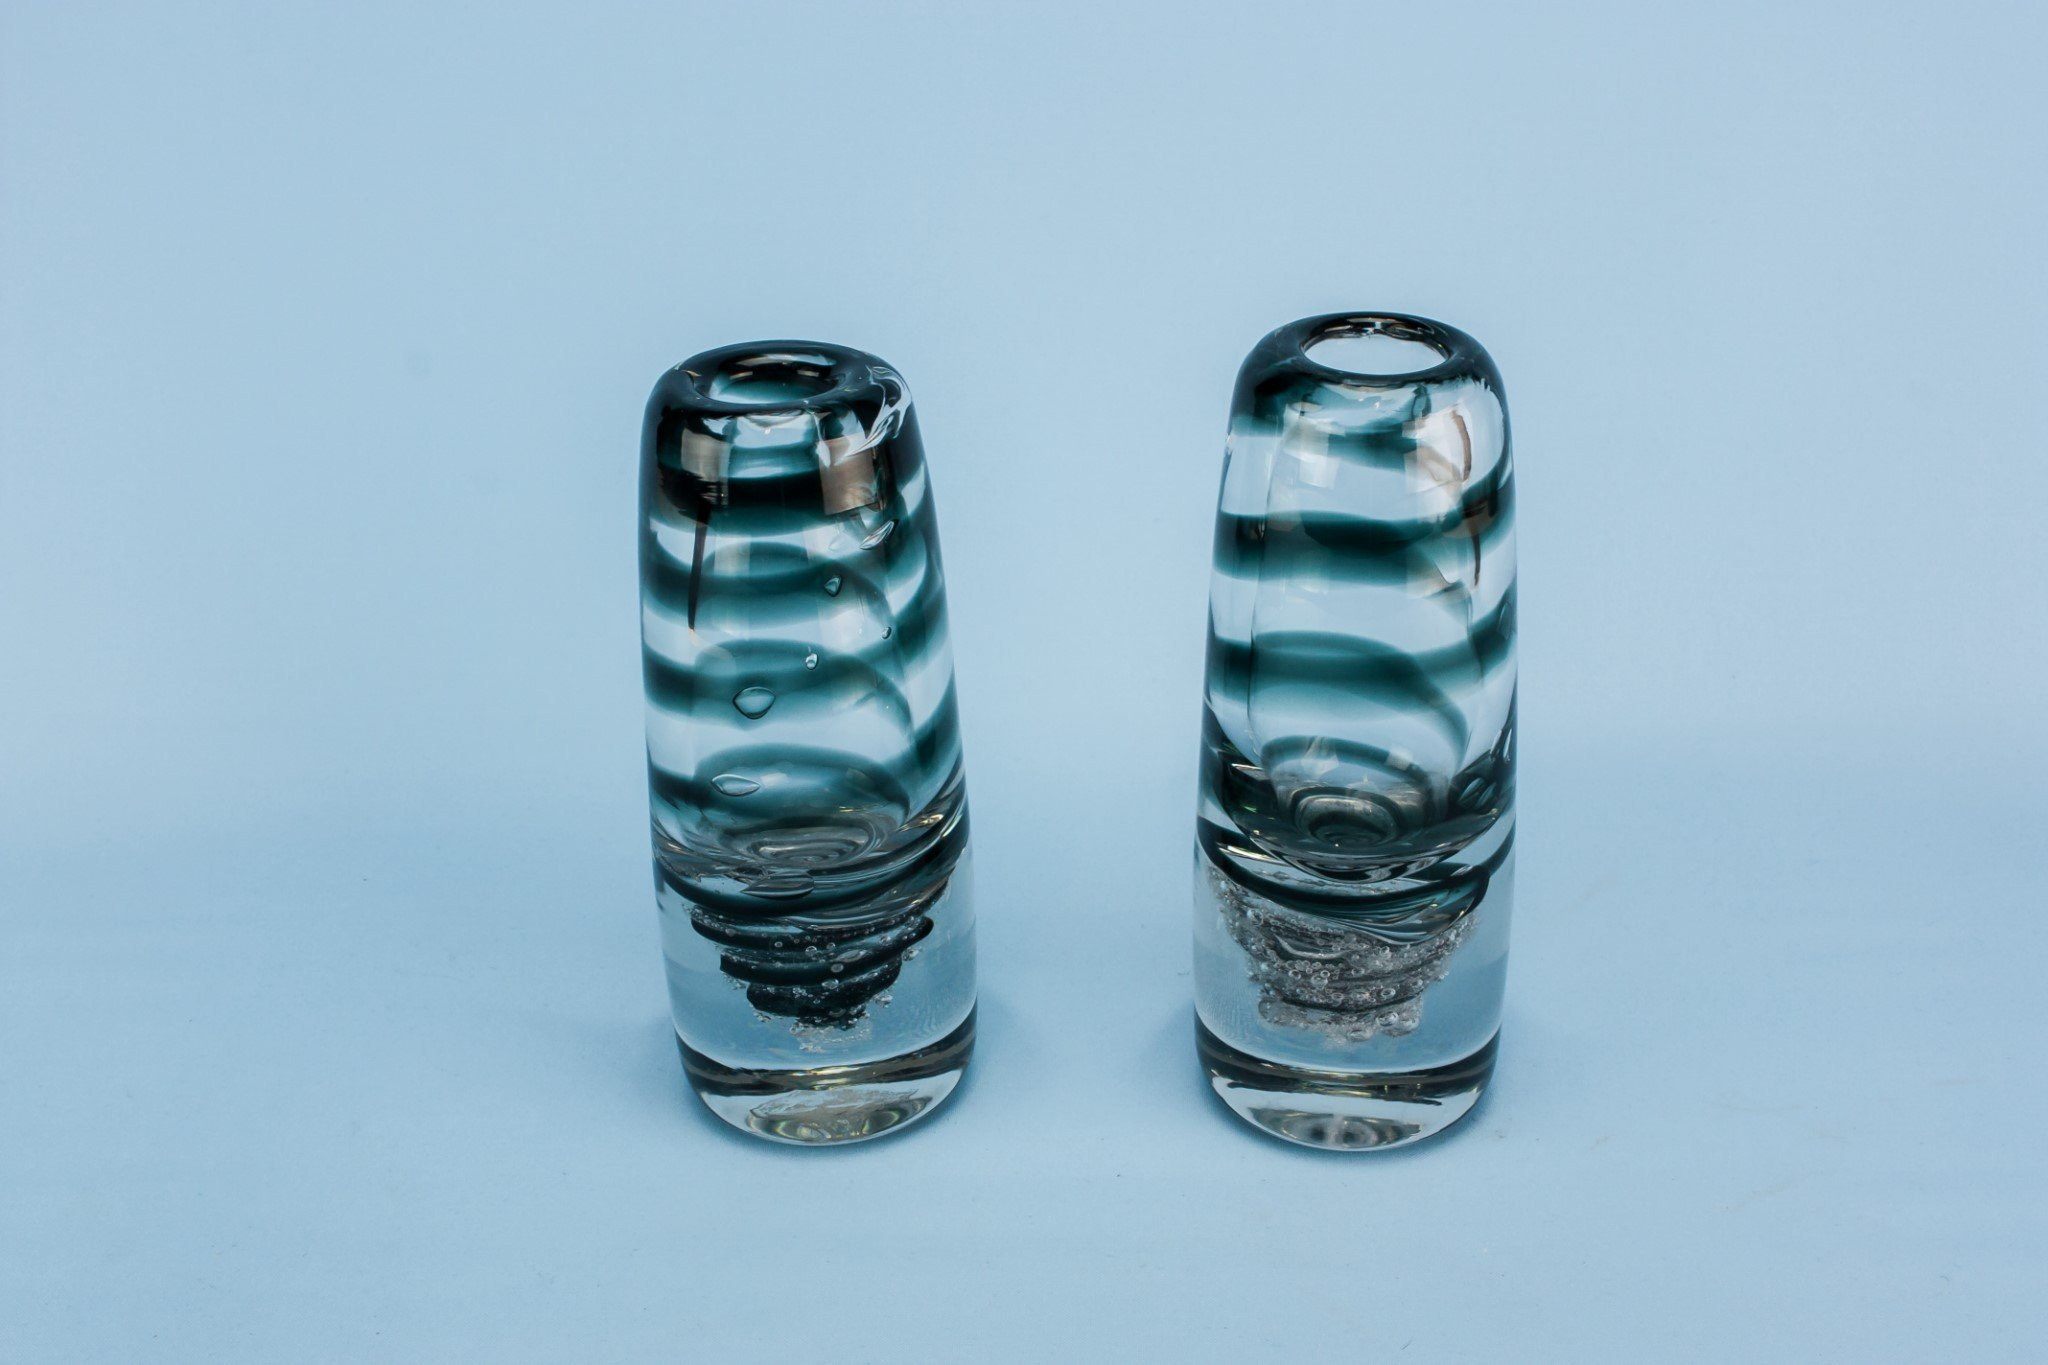 viking glass green vase of 17 fresh antique blue glass vases bogekompresorturkiye com regarding 2 glass vases